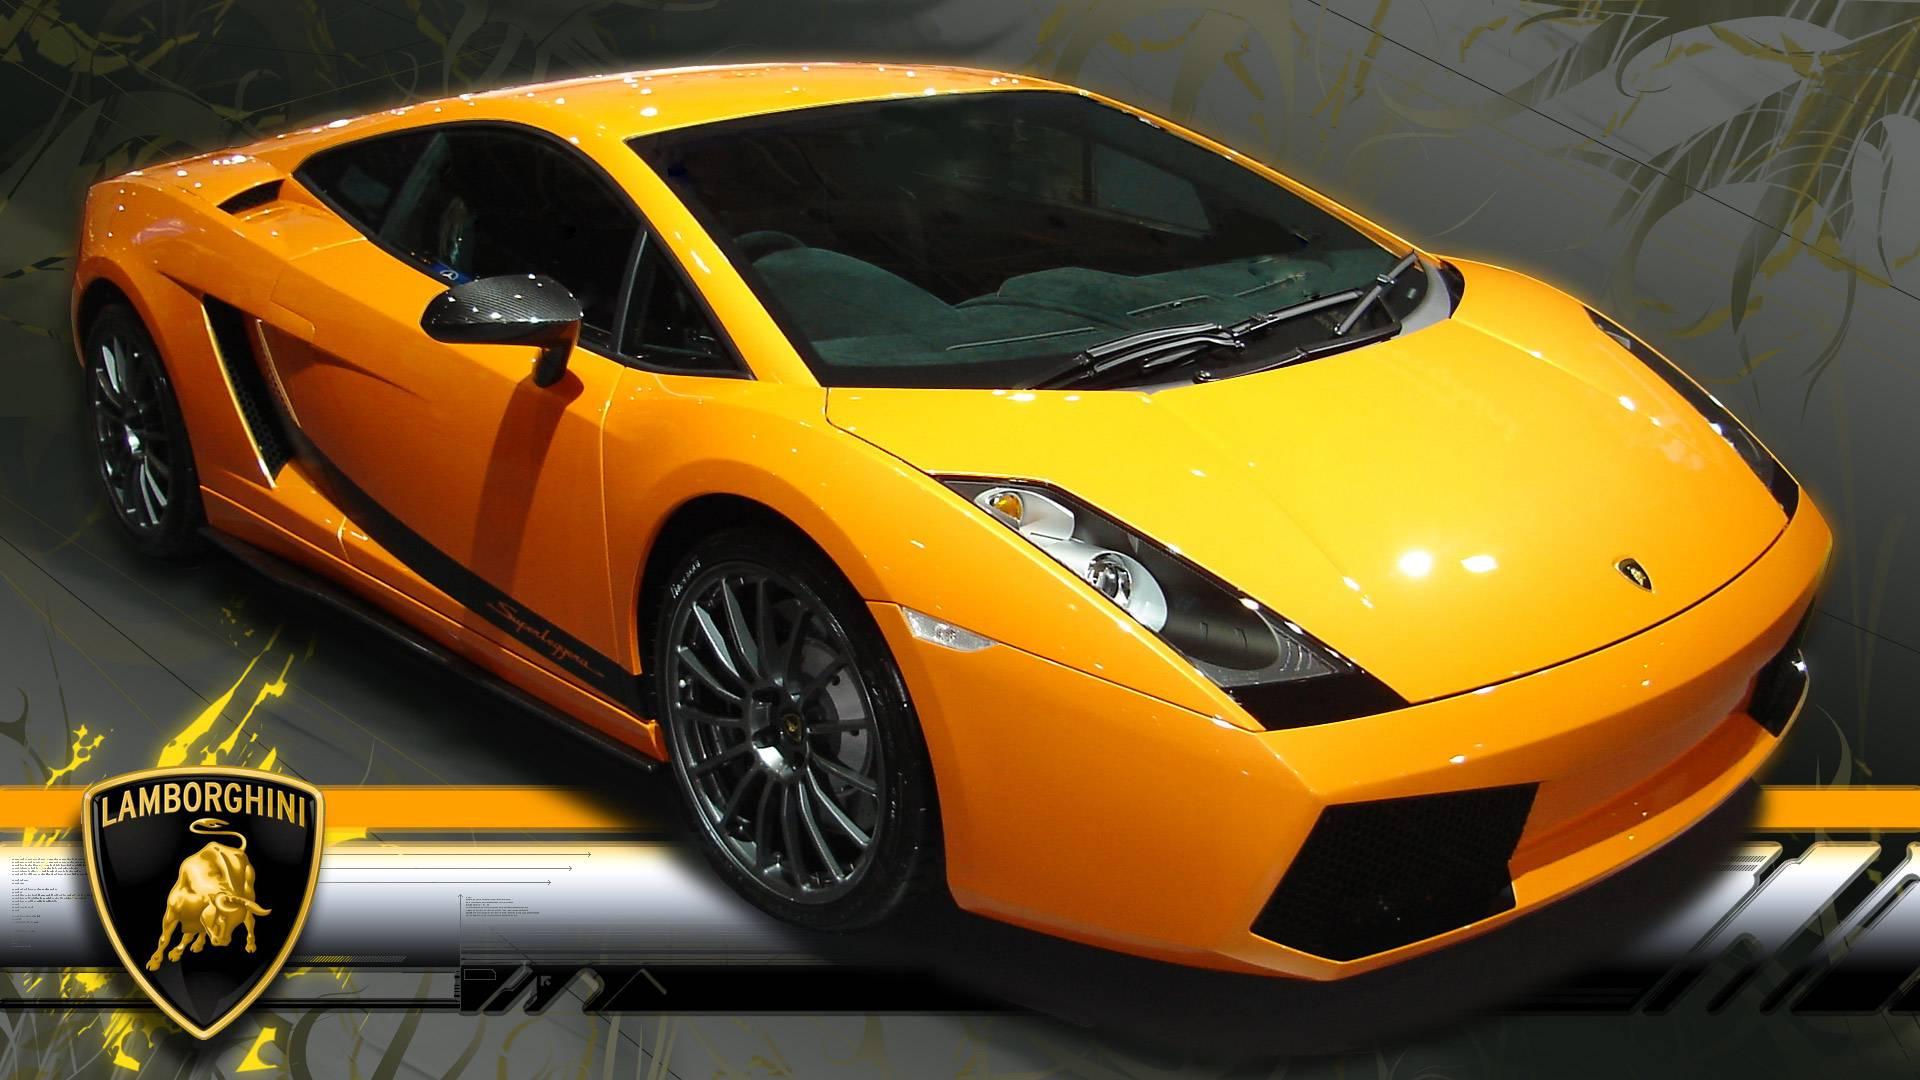 Lamborghini Cars Pictures 7 Car Desktop Background